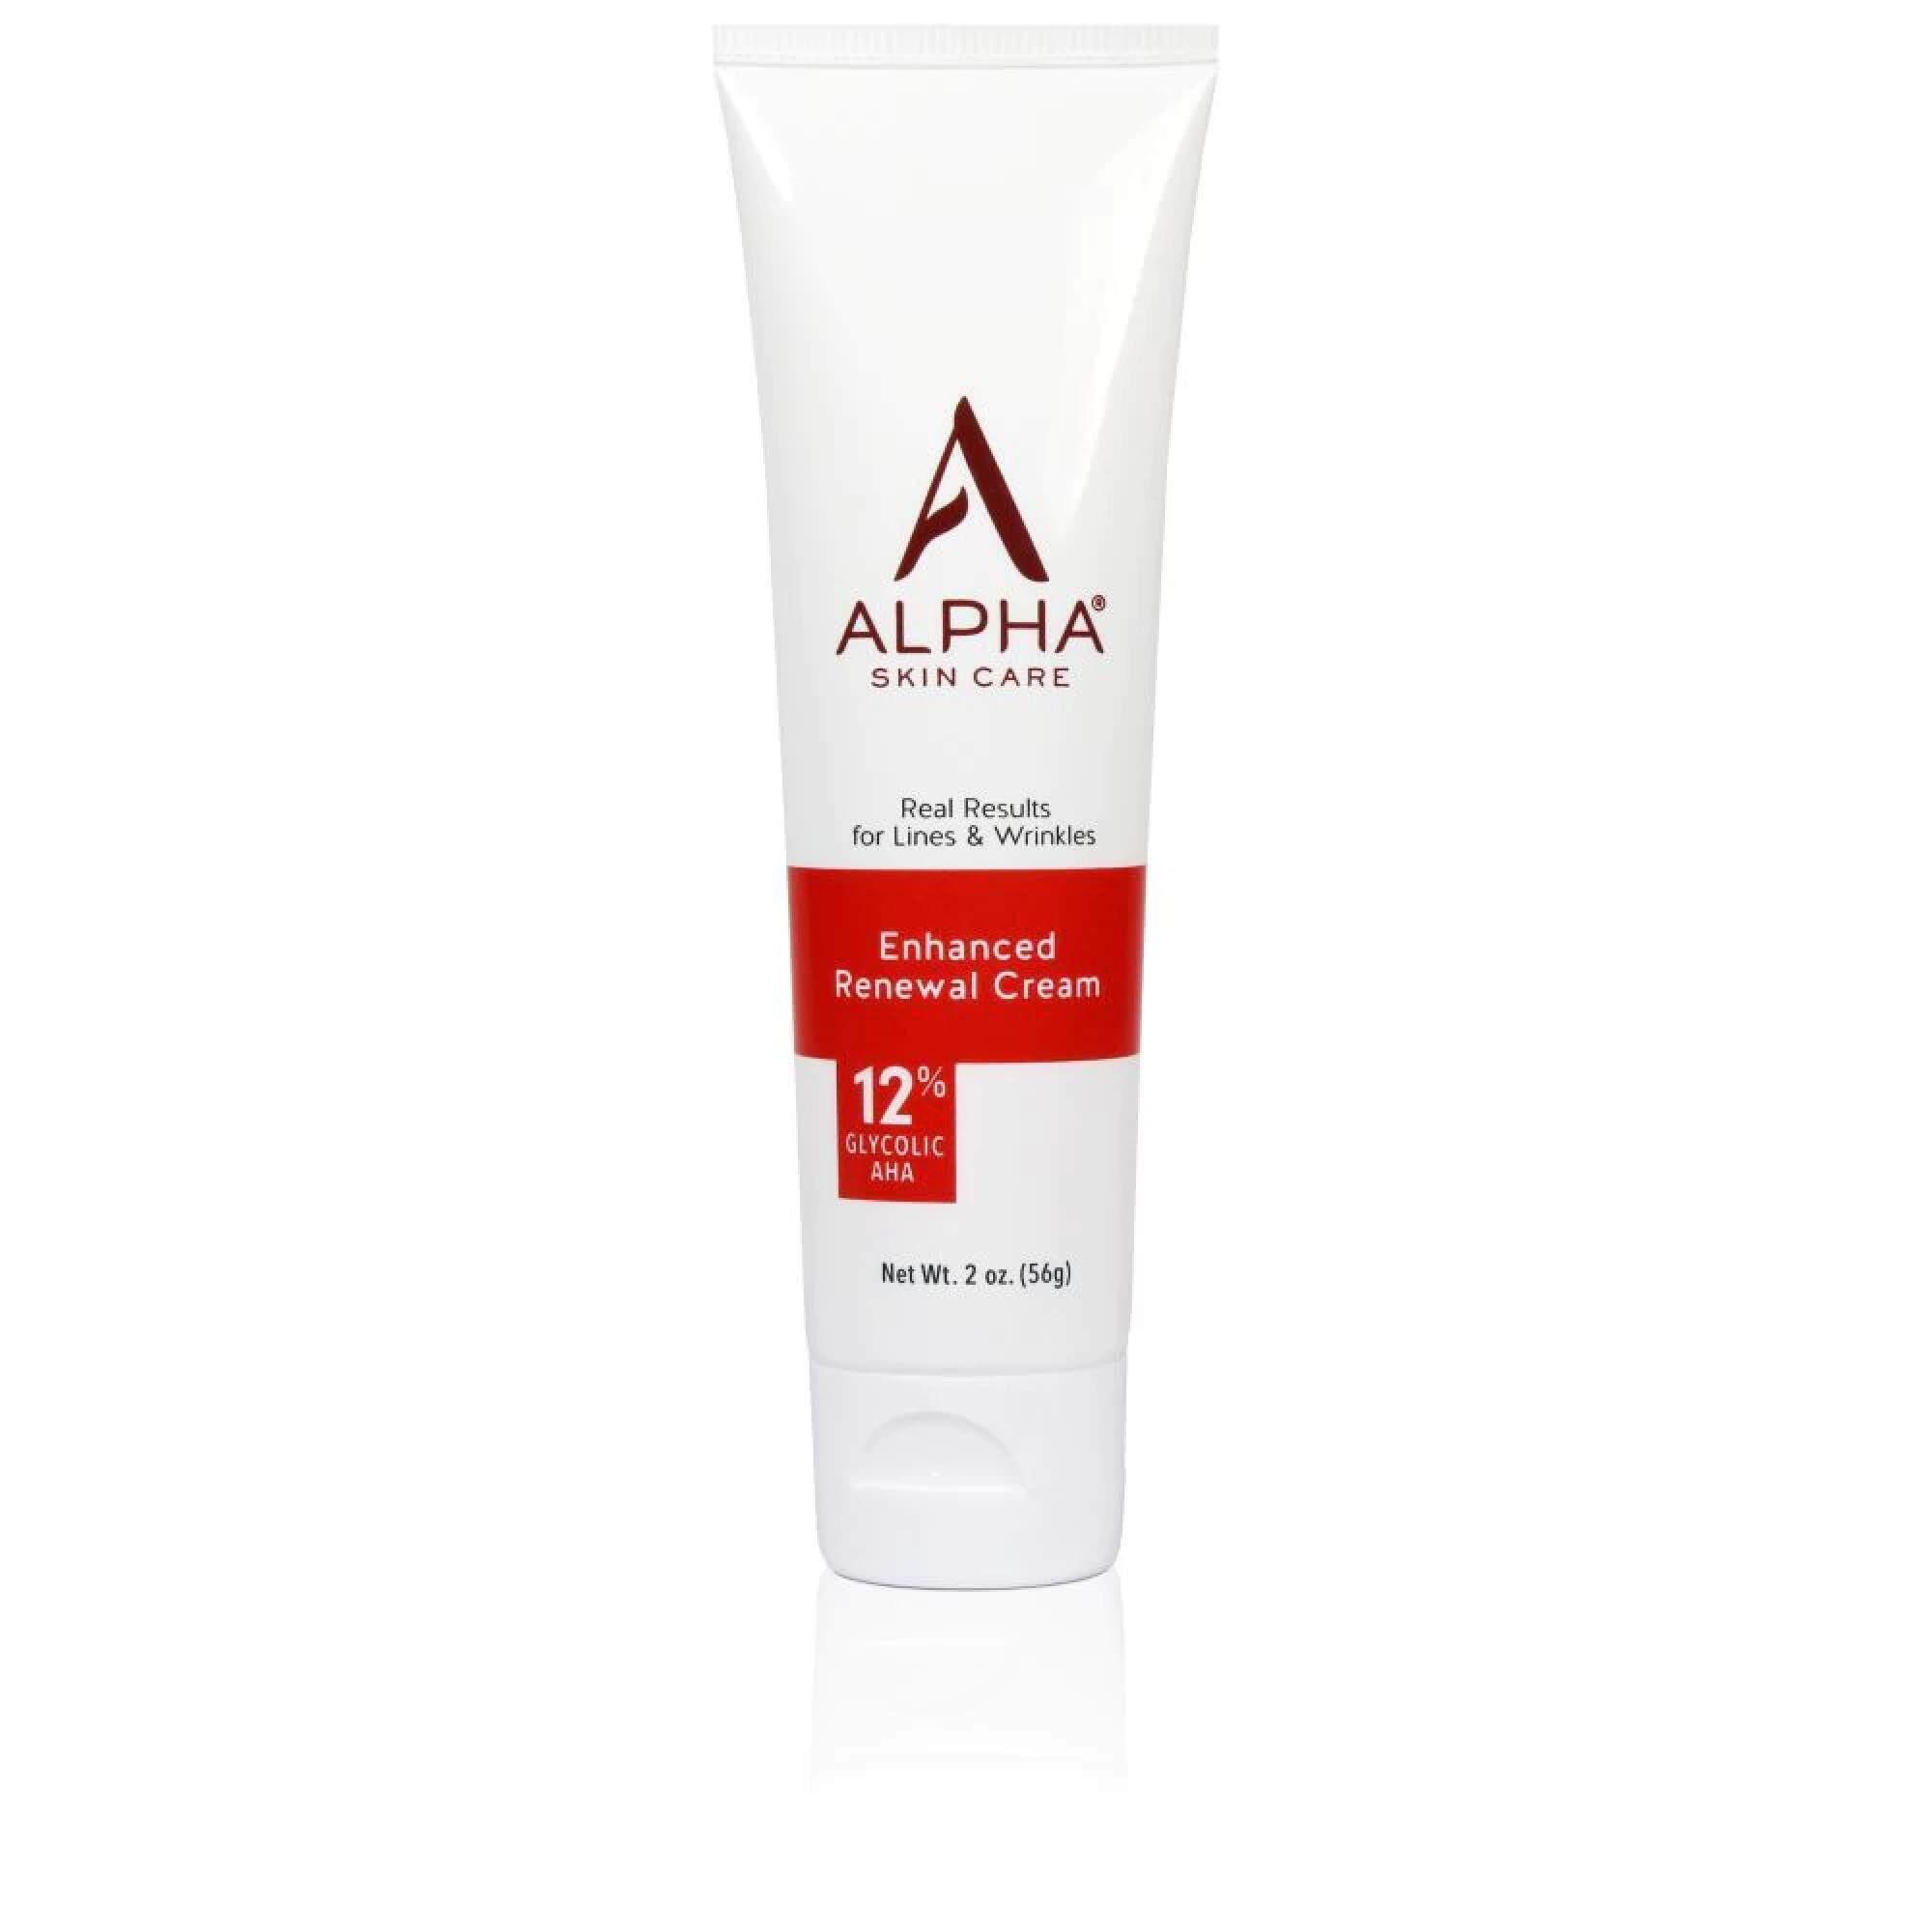 Alpha Skin Care Enhanced Renewal Cream with 12% AHA